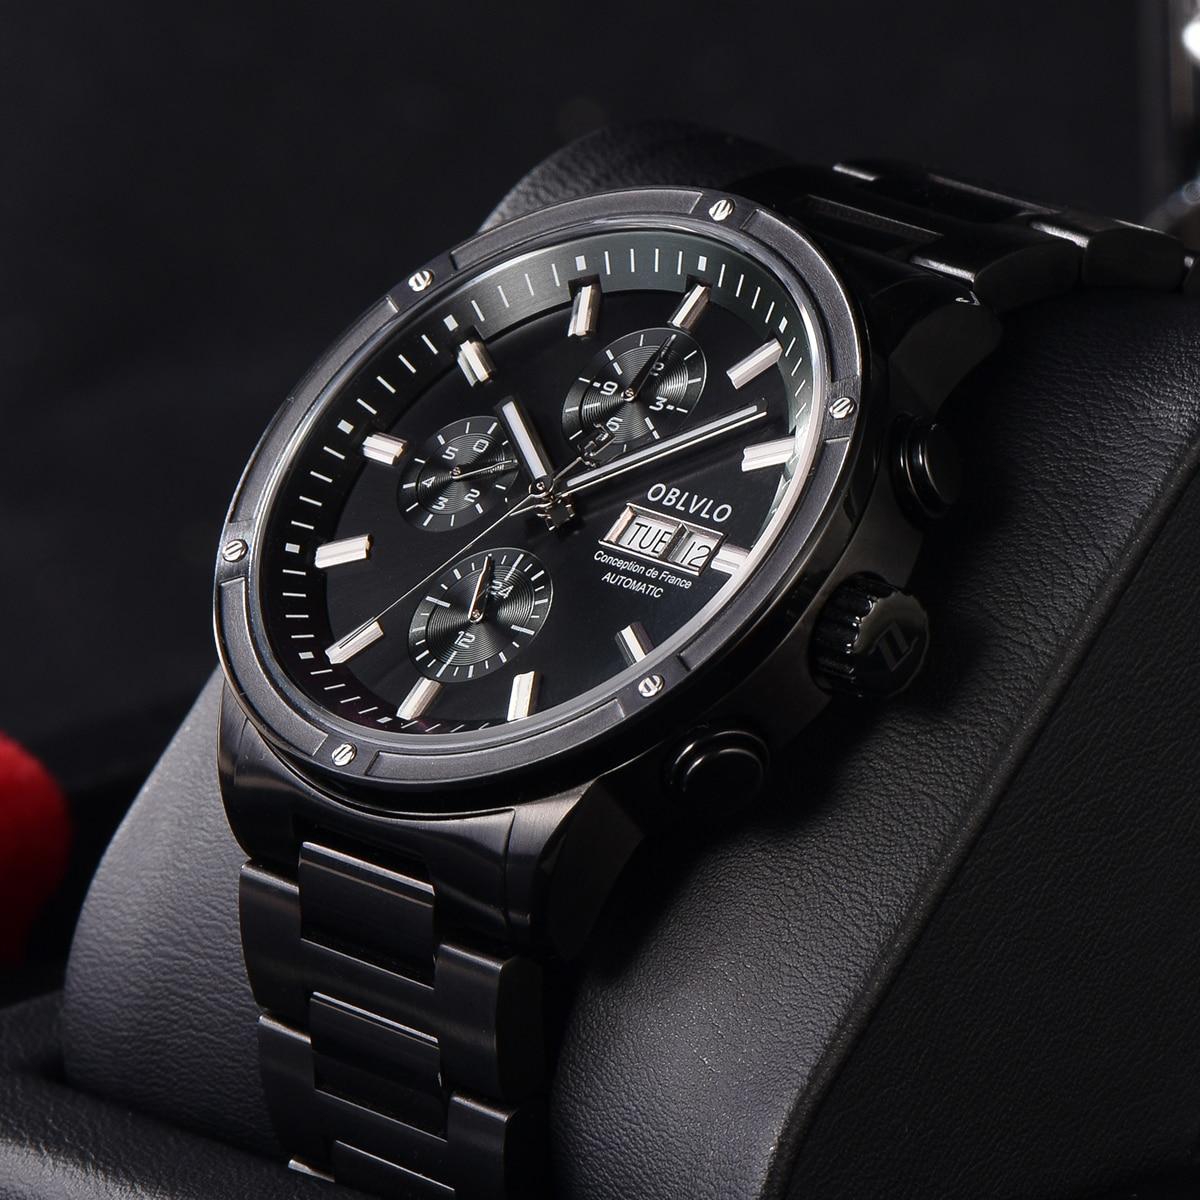 OBLVLO Men Watch Top Brand Automatic Mechanical Casual Watch All Black Date Watch Men Waterproof Rel